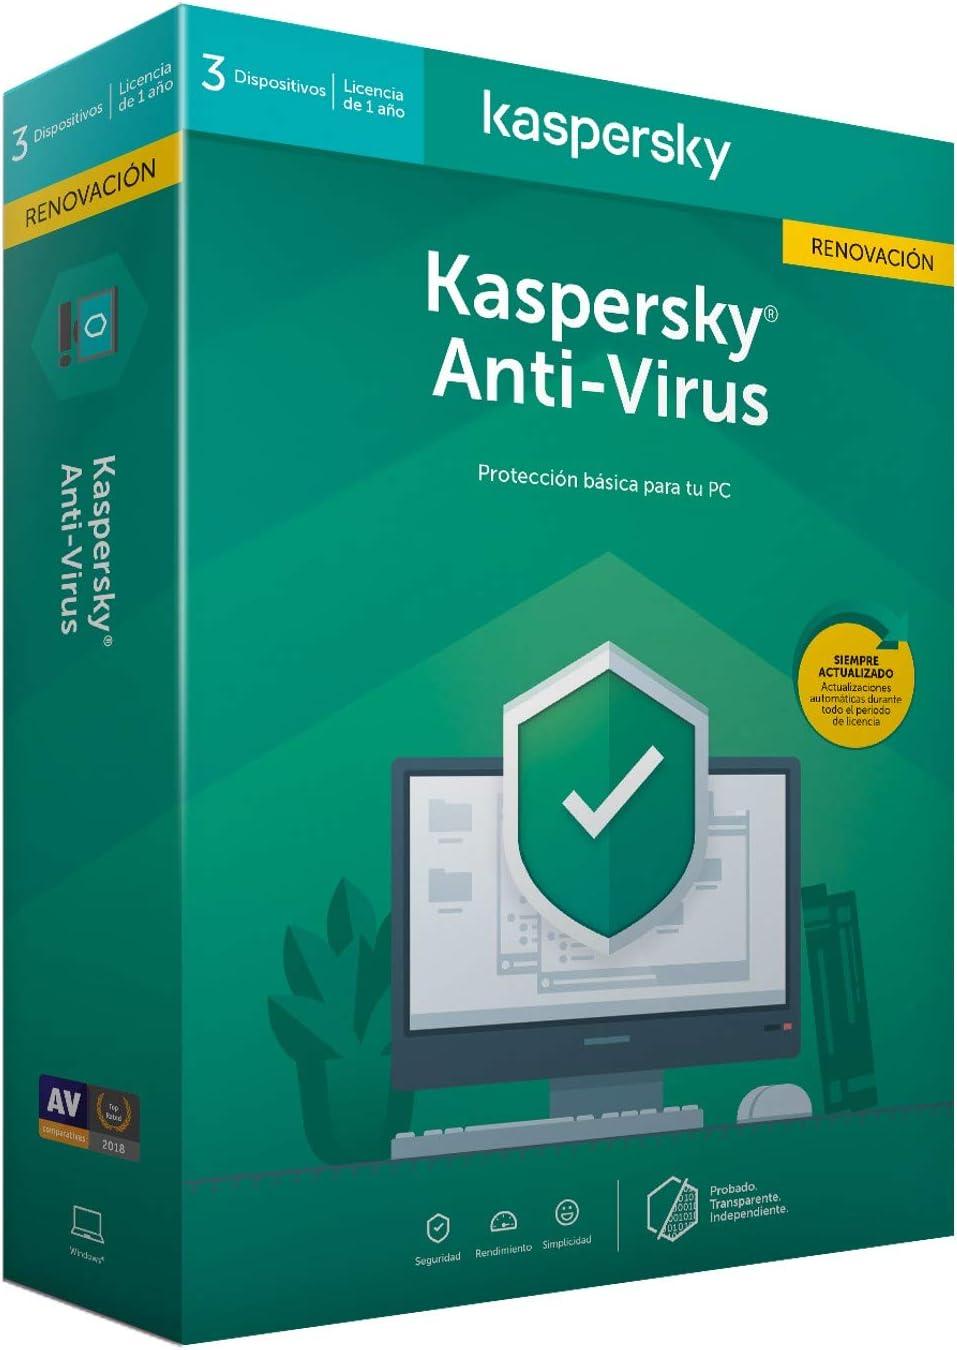 Kaspersky Renovacion Kav 2020 - Antivirus, 3 Licencias, 1 Año